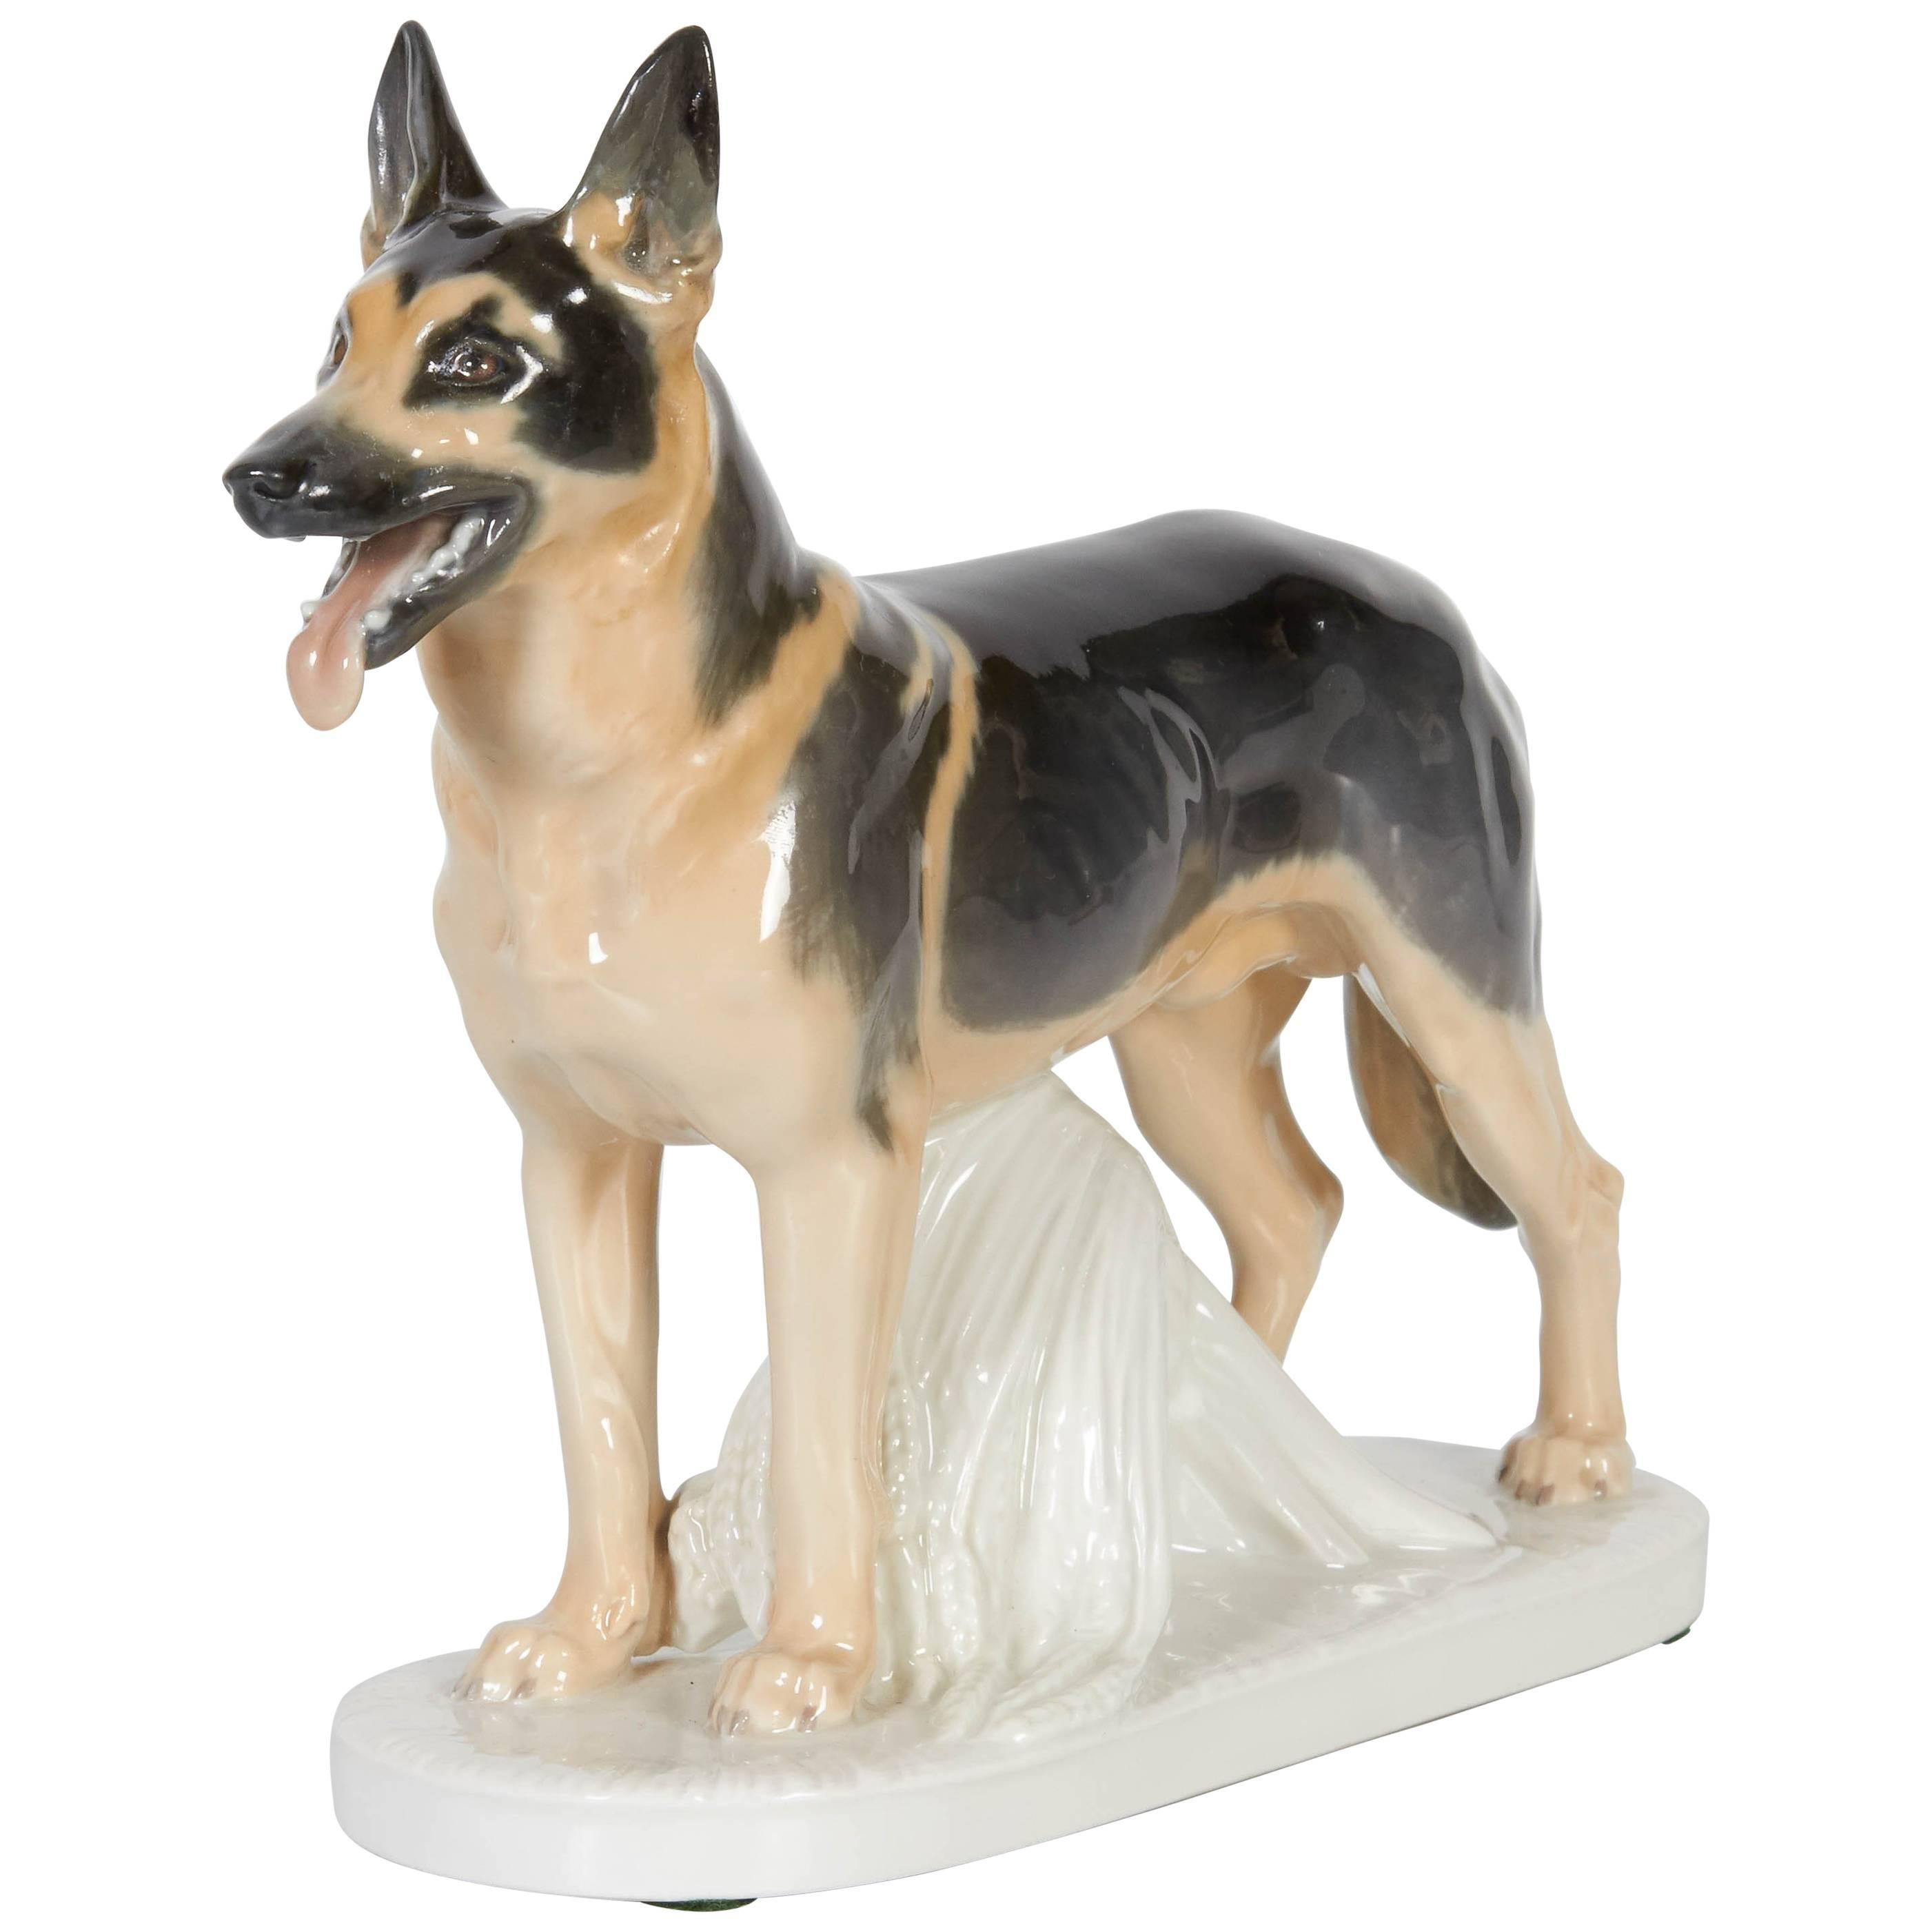 Meissen Porcelain Figure of German Shepherd Dog